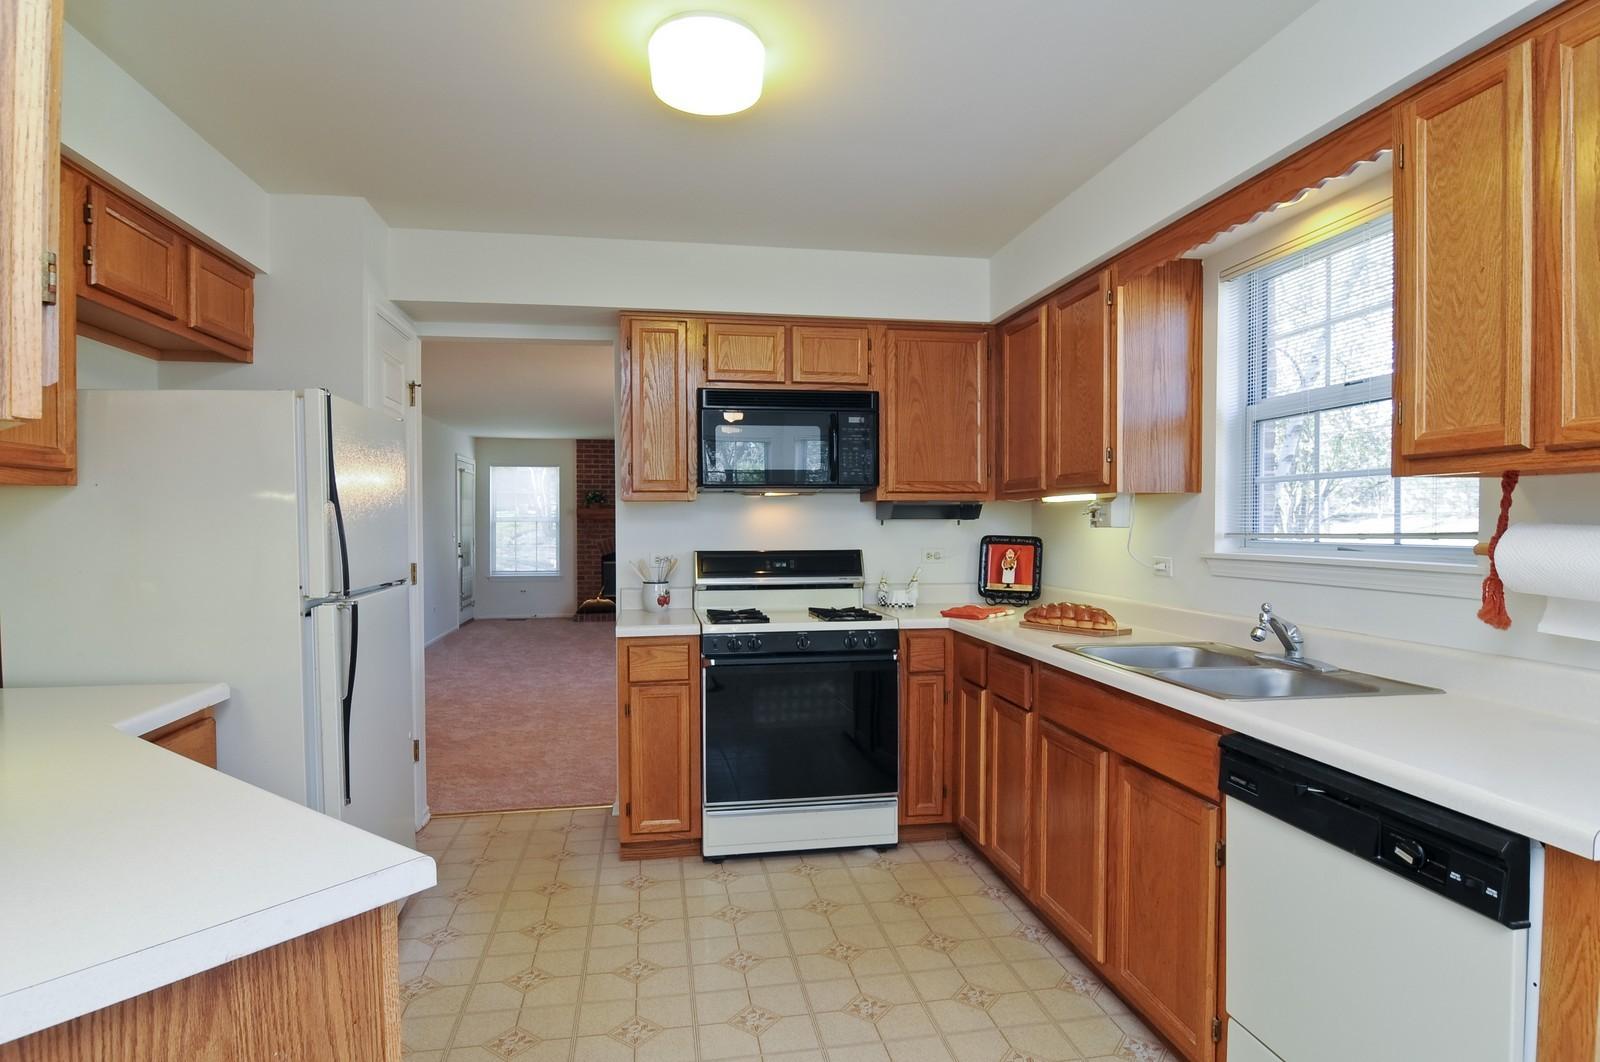 Real Estate Photography - 534A Penny Lane, Crystal Lake, IL, 60014 - Kitchen